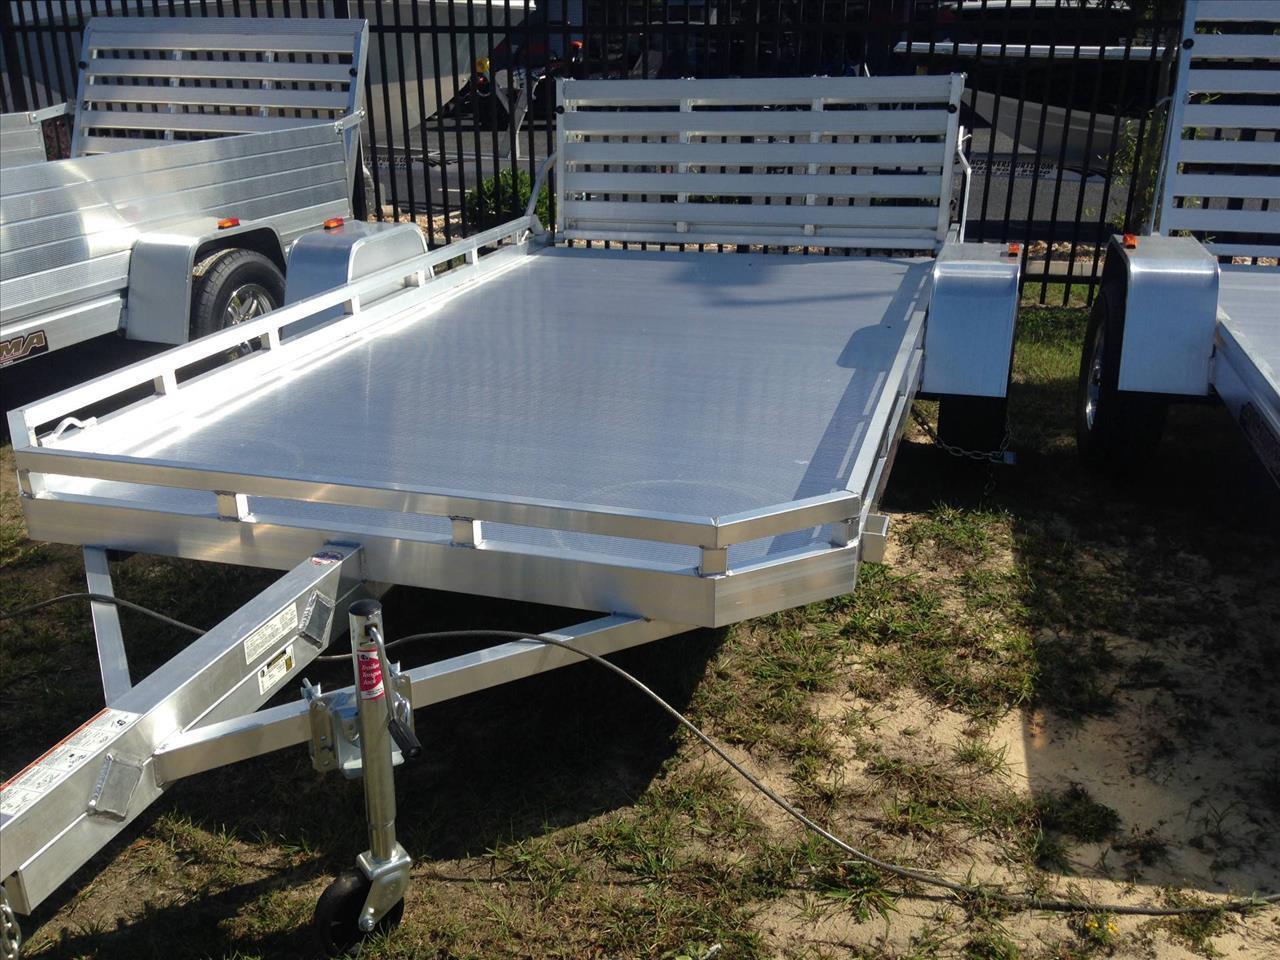 2017 Aluma UT14 for sale at Vehicle Network, LLC - Performance East, INC. in Goldsboro NC